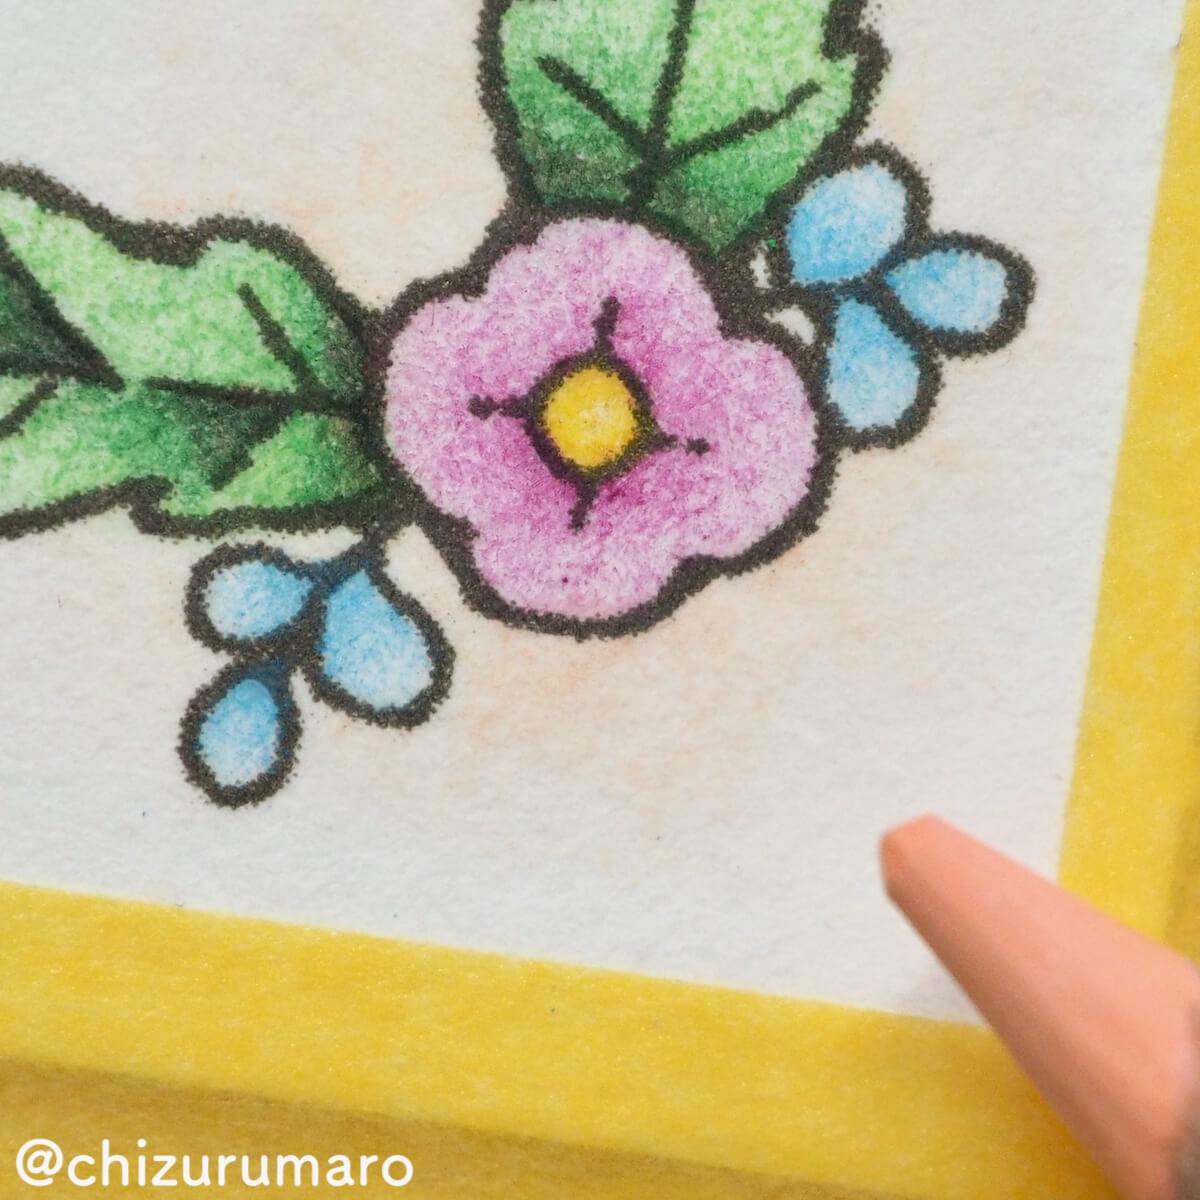 f:id:chizurumaro:20200227212022j:plain